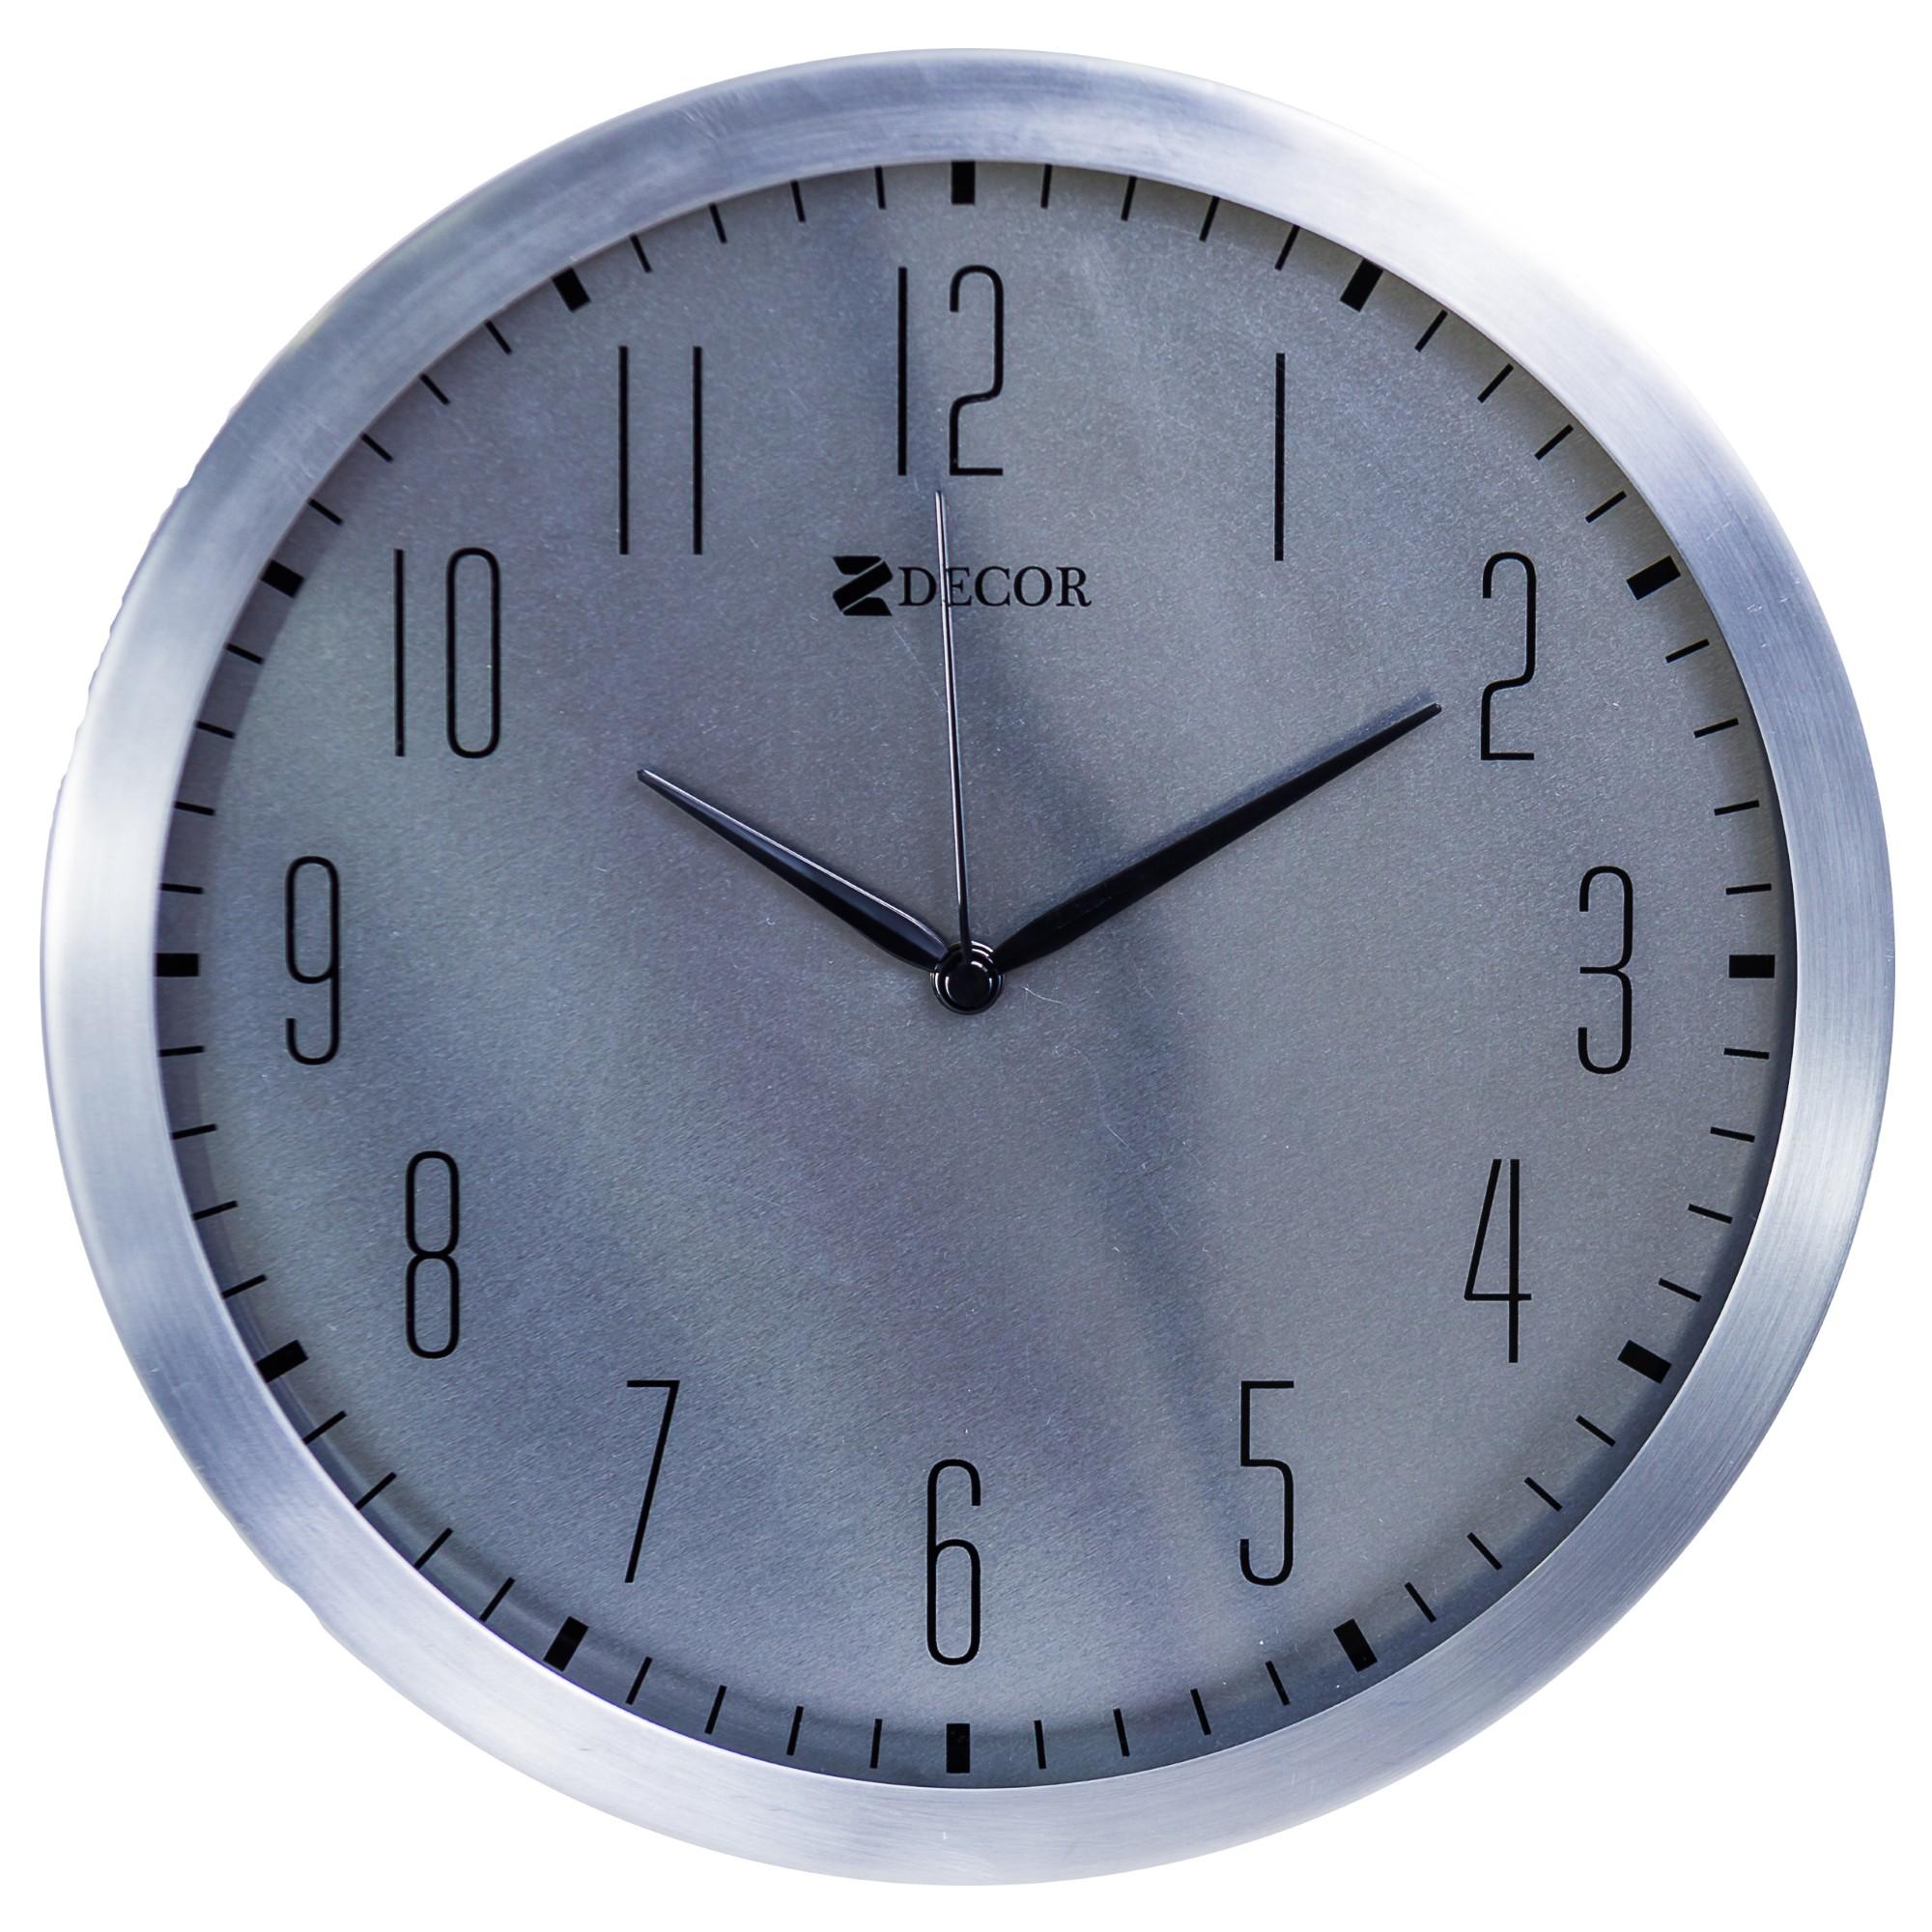 cc1ecd0f2f3 Ferreira Costa - Relógio de Parede Work Alumínio 39